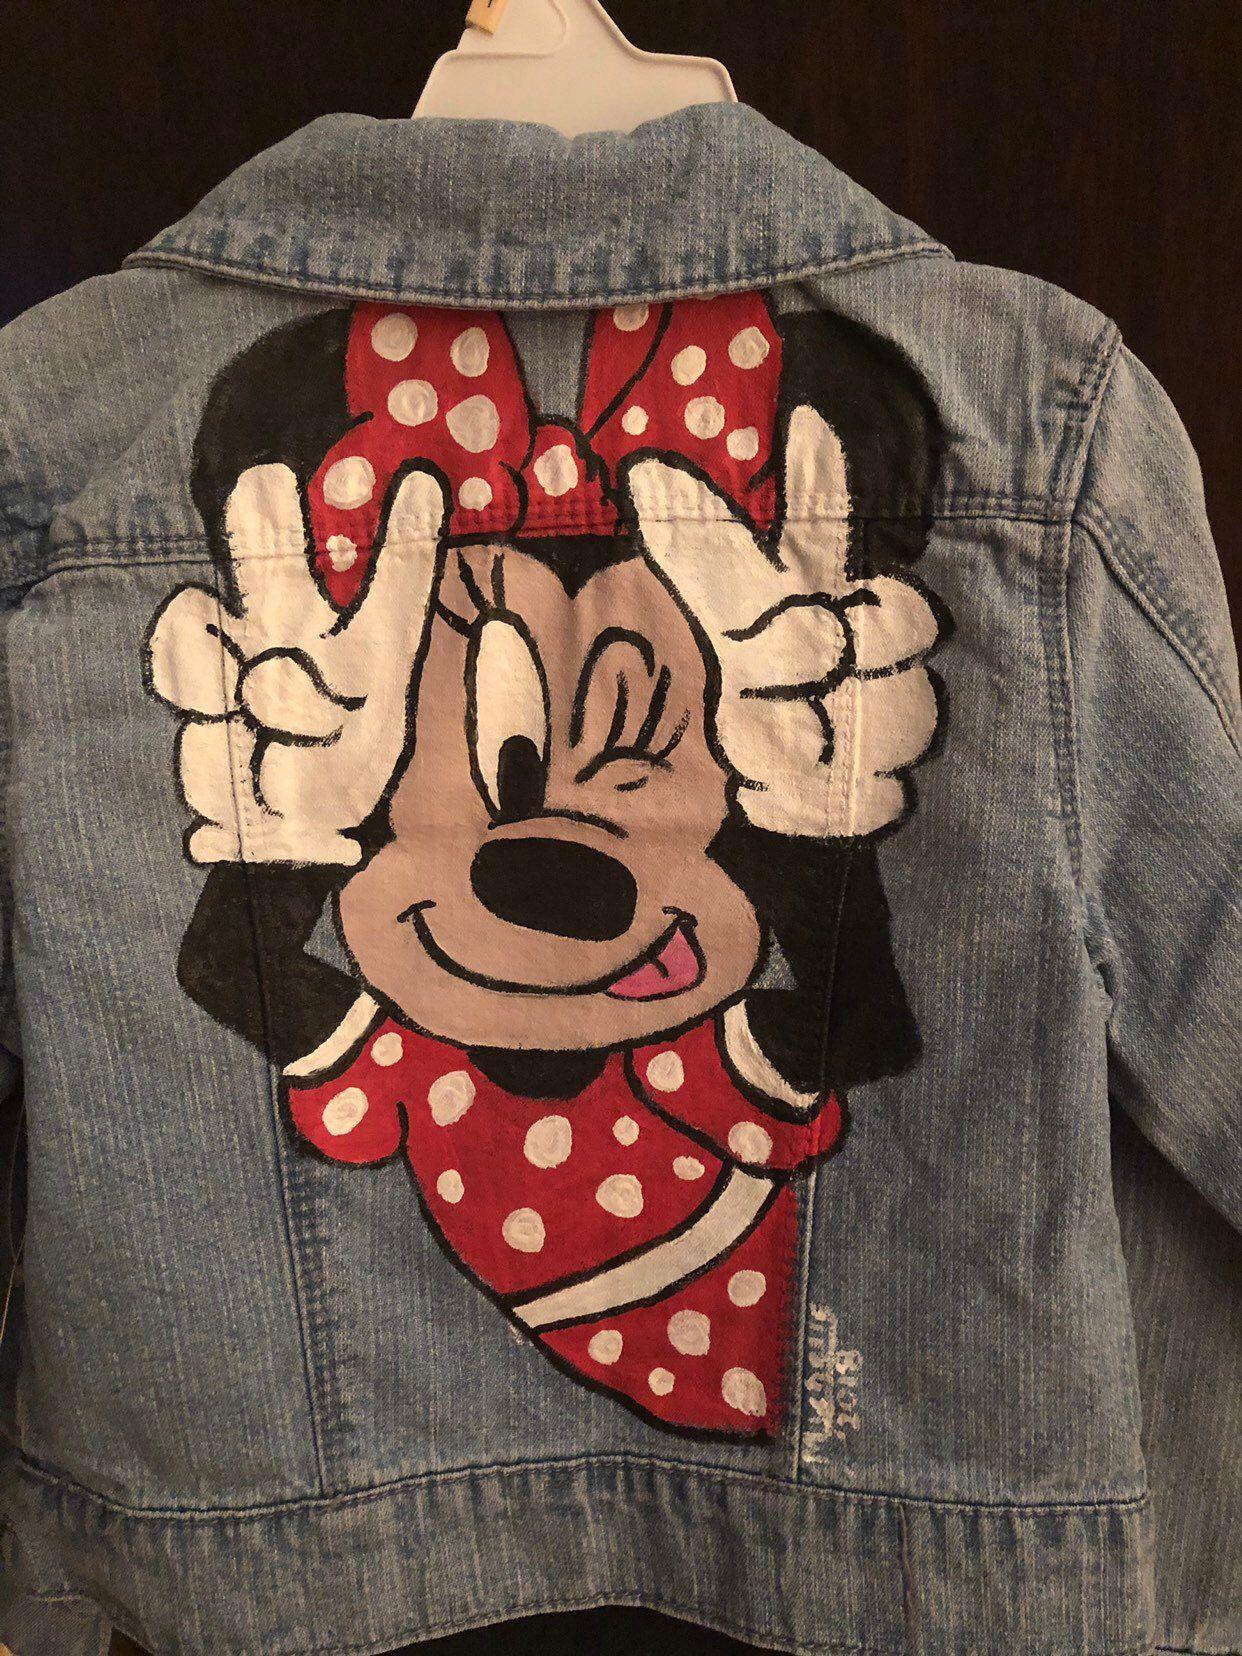 Minnie Mouse Denim Jacket Girls Size 7 S Etsy Painted Clothes Diy Hand Painted Denim Jacket Painted Jacket [ 1656 x 1242 Pixel ]